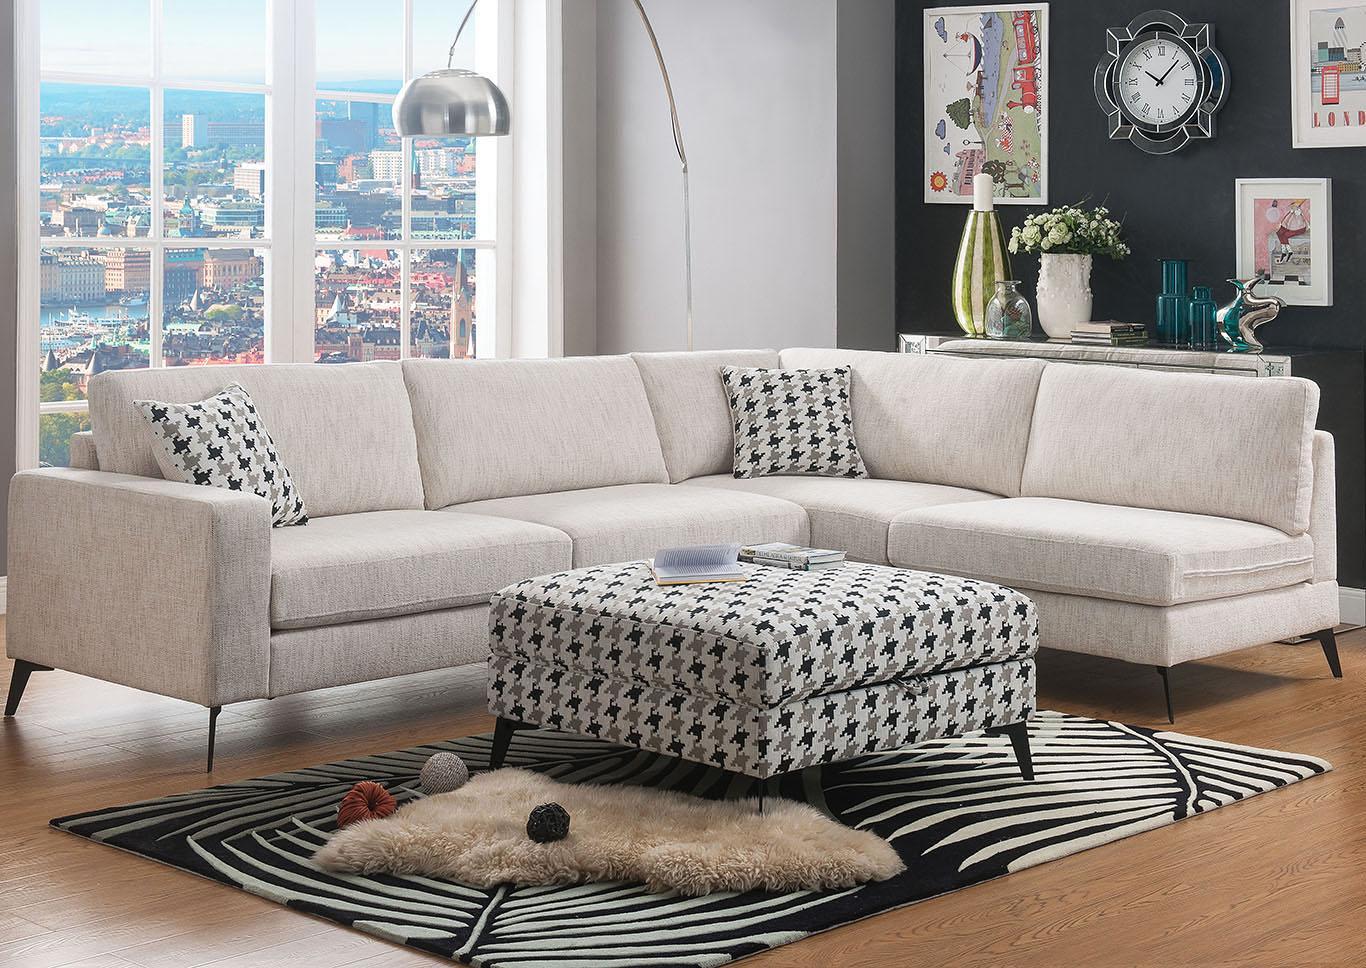 Magnificent 5Th Avenue Furniture Mi Crocosmia Sectional Sofa Dailytribune Chair Design For Home Dailytribuneorg